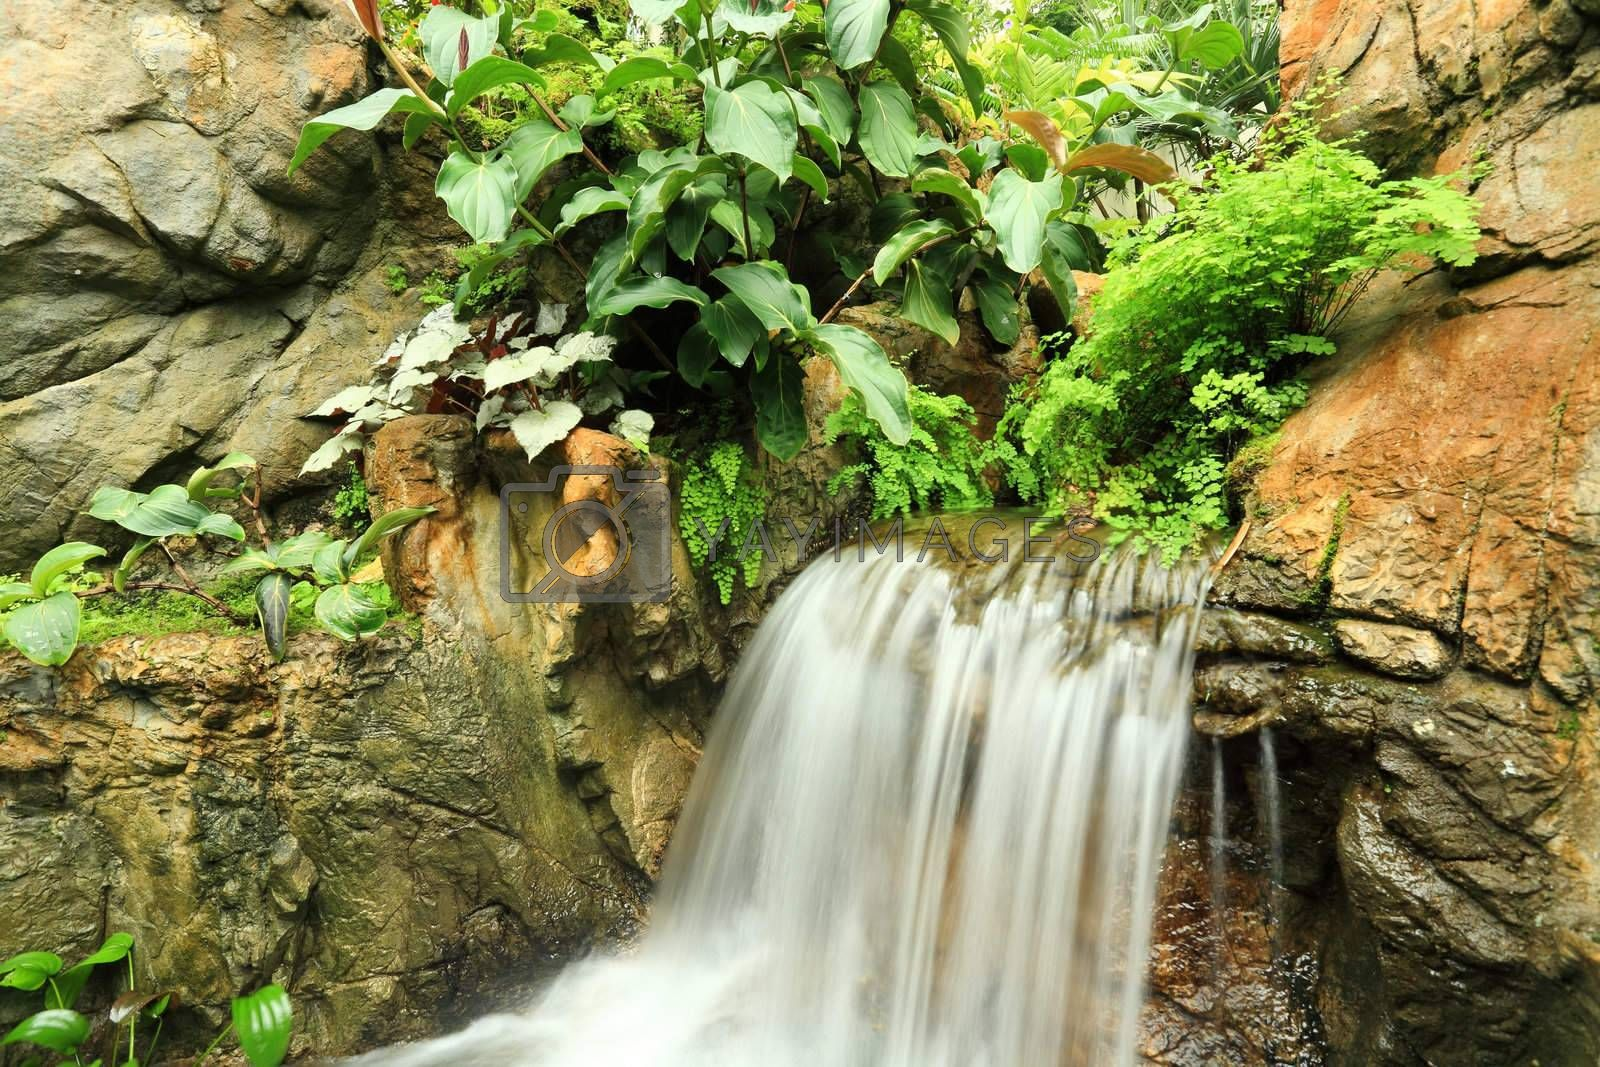 Royalty free image of waterfall by leungchopan